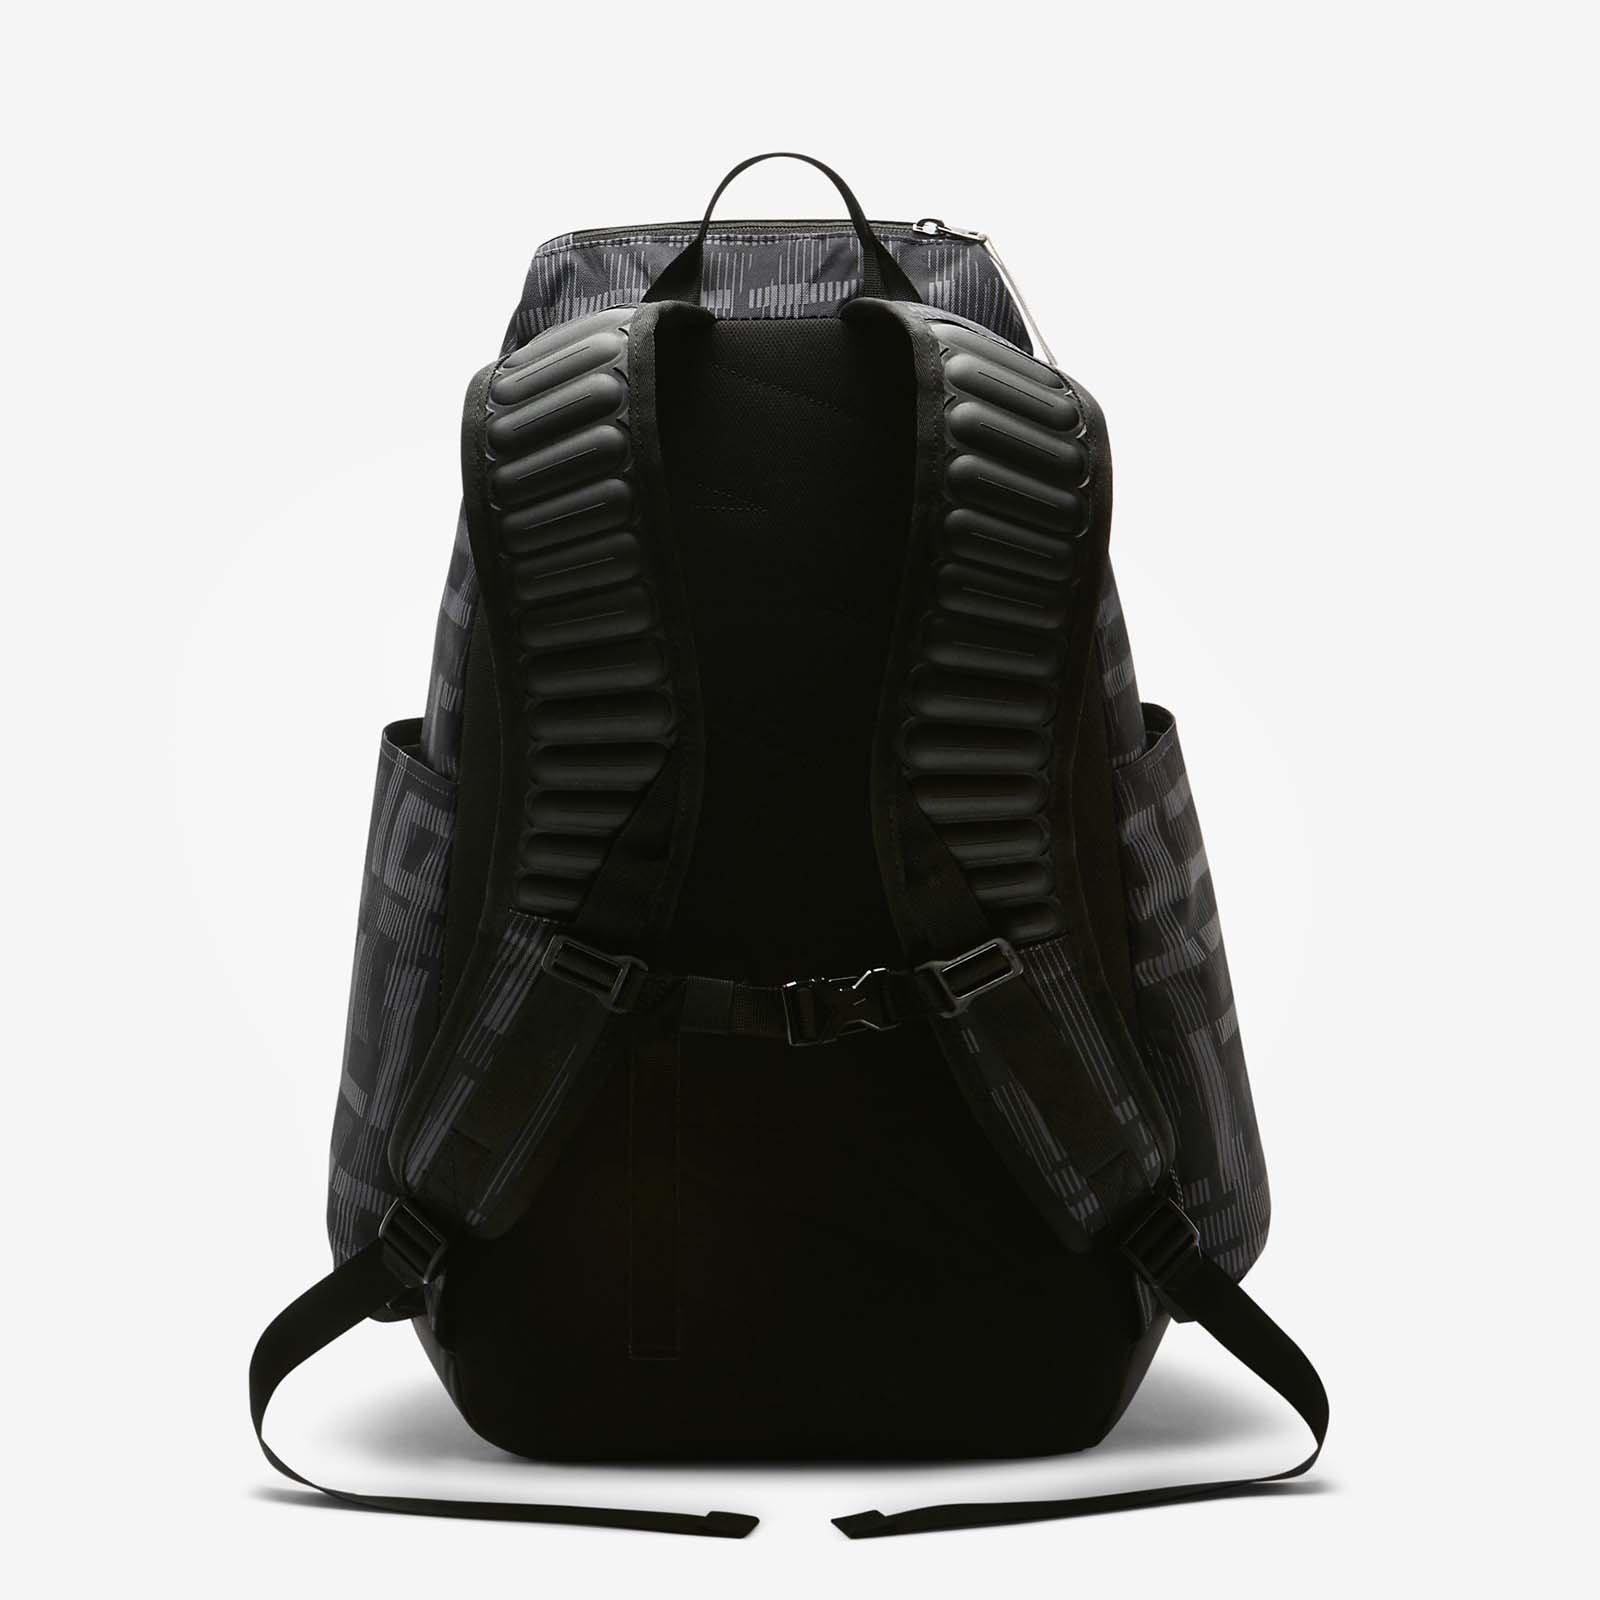 Nike Hoops Elite Max Air Team 2.0 Graphic Basketball Backpack Black/White by NIKE (Image #2)